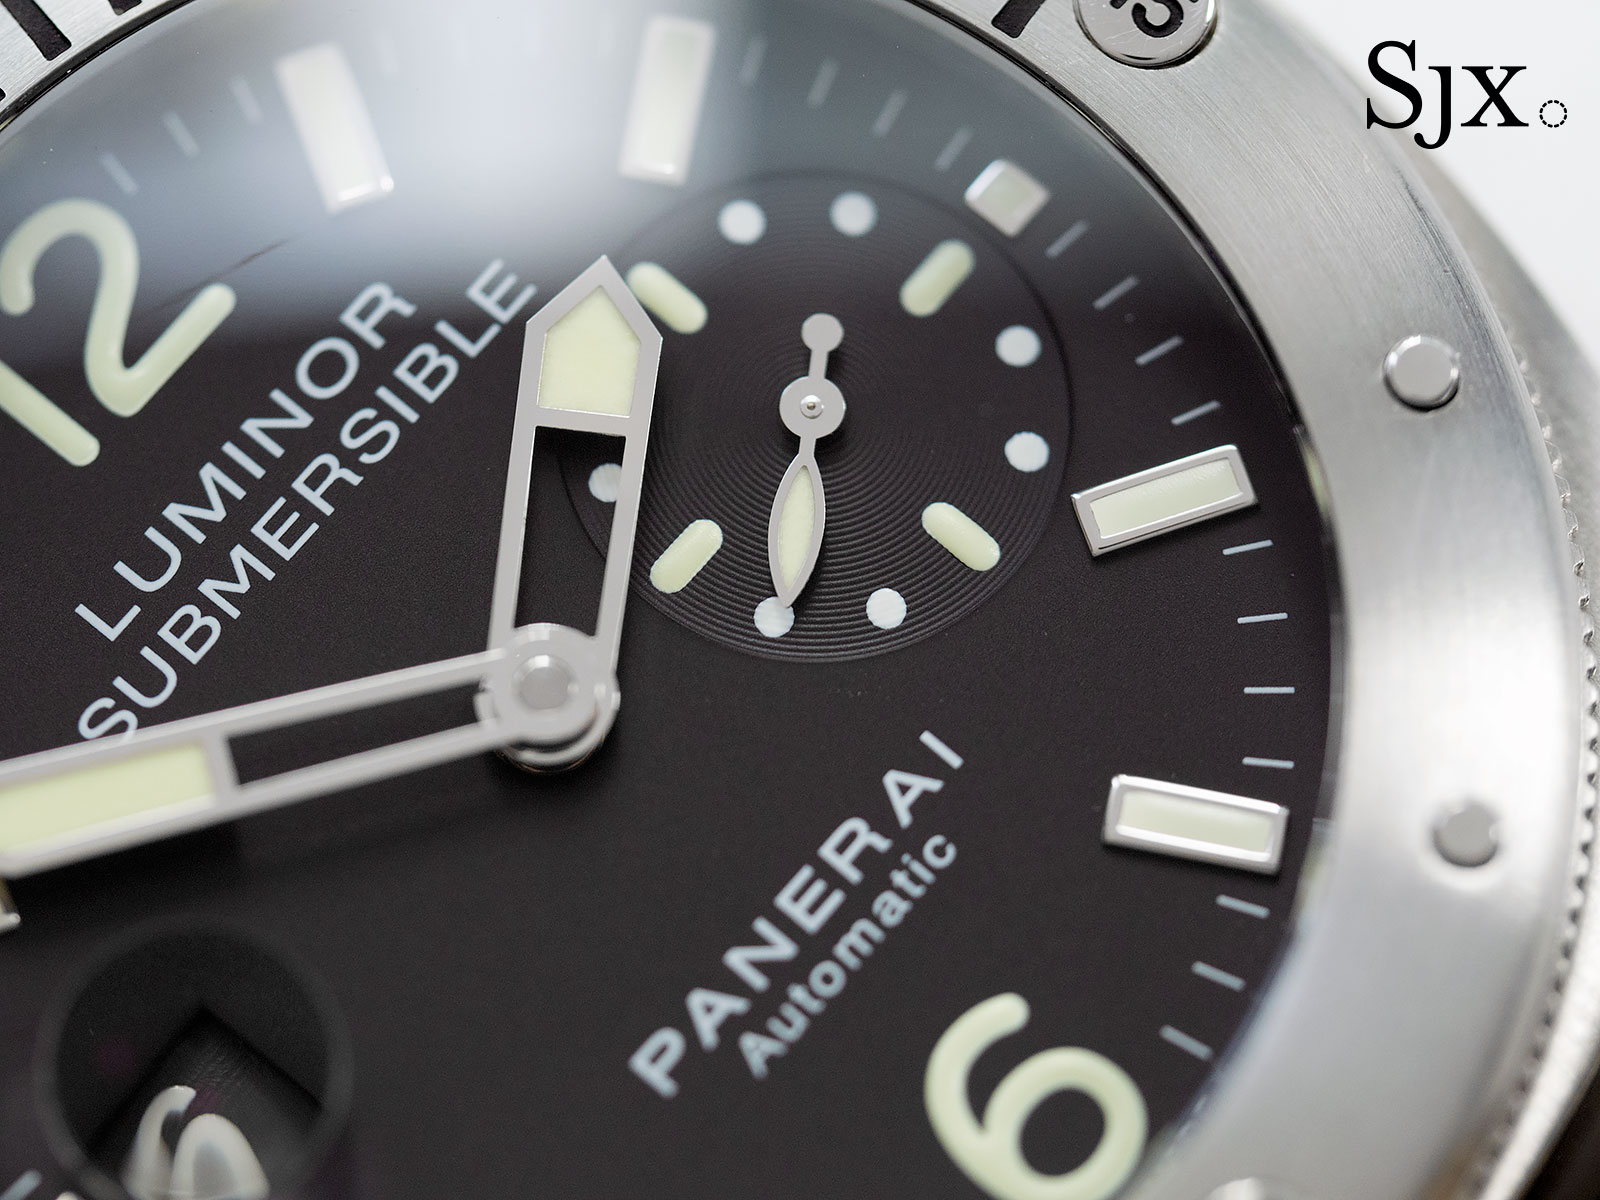 Panerai Submersible Destro Chronopassion PAM239-4